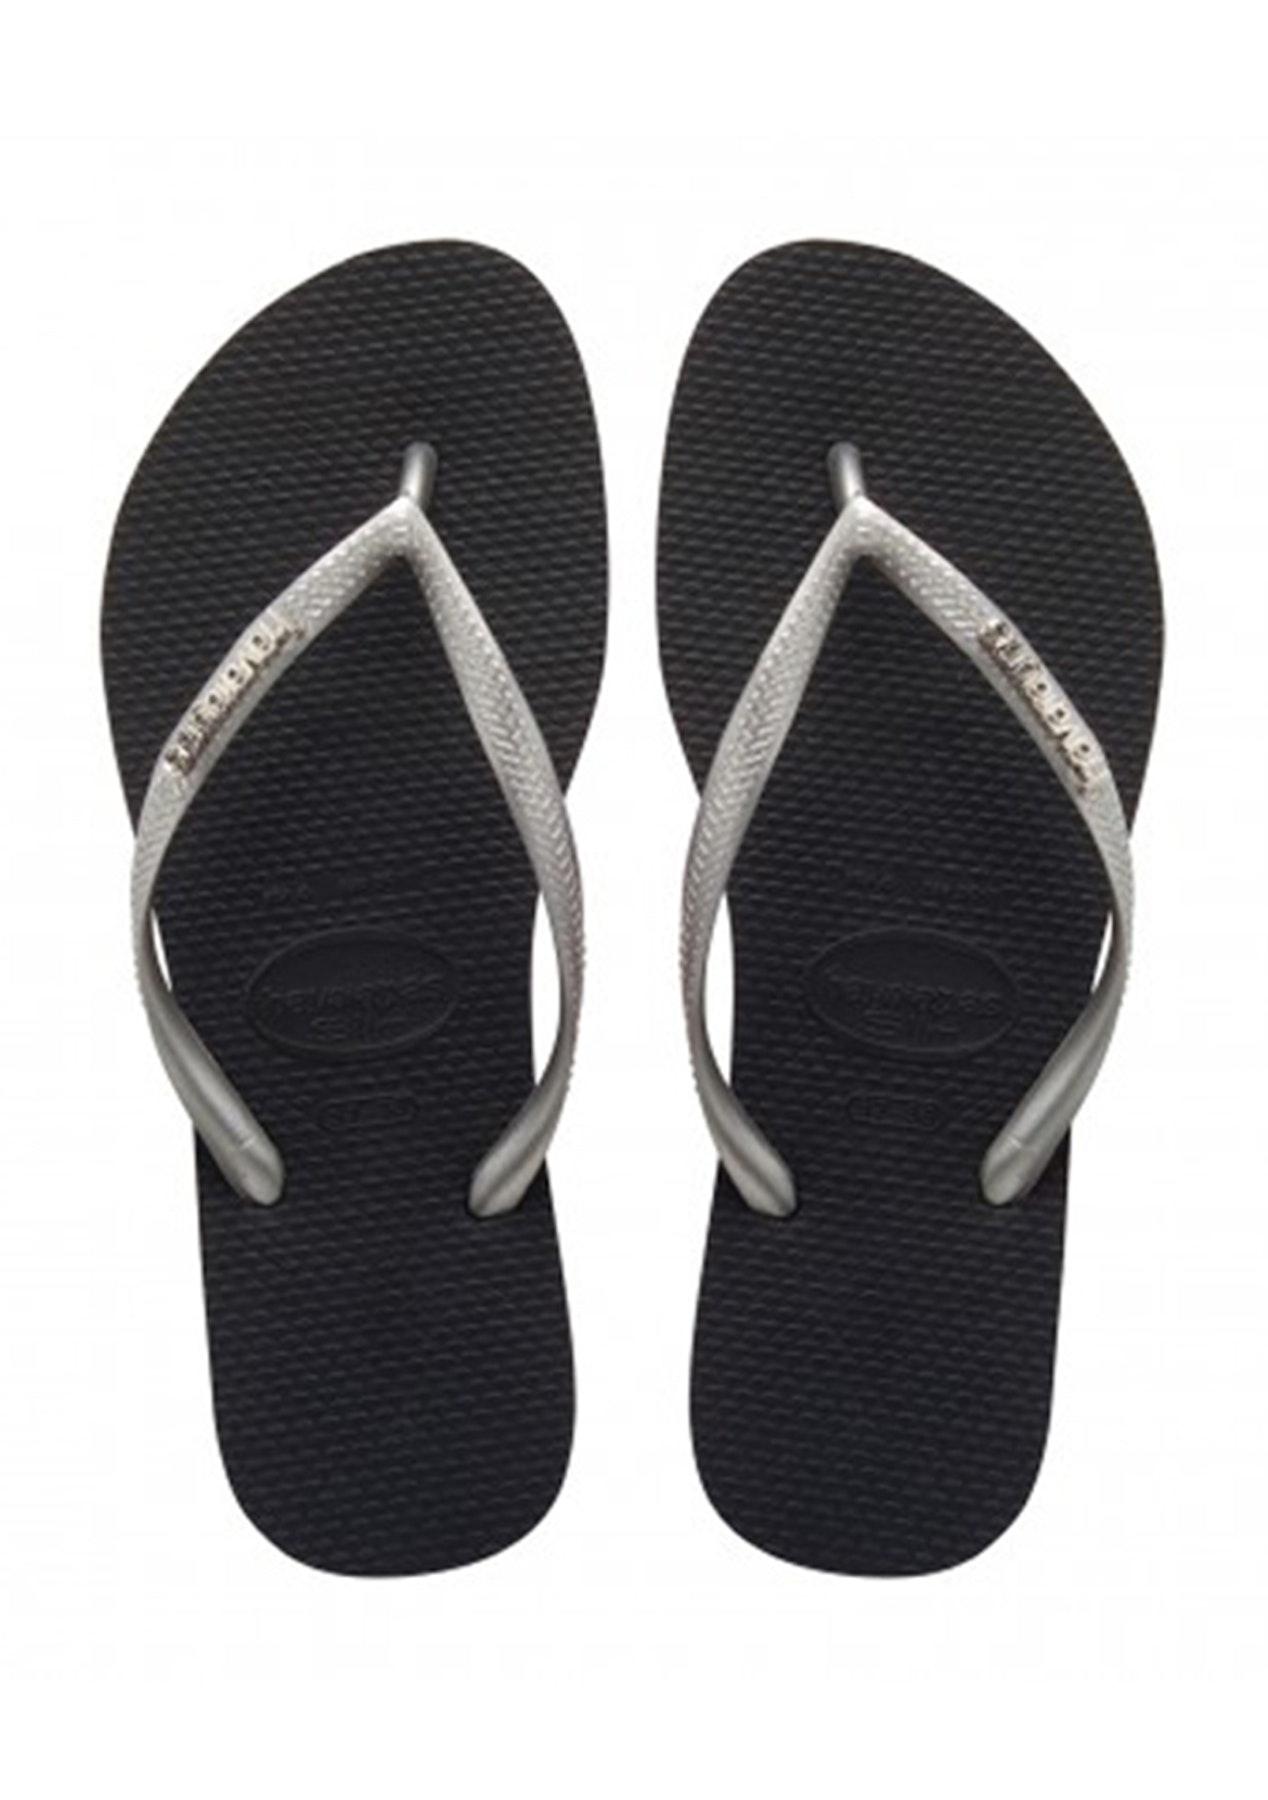 a5c0cc0cefd2 Havaianas - Slim Logo Metallic 3761 - Black   Silver   Silver - Boxing Day  Havaianas - Onceit